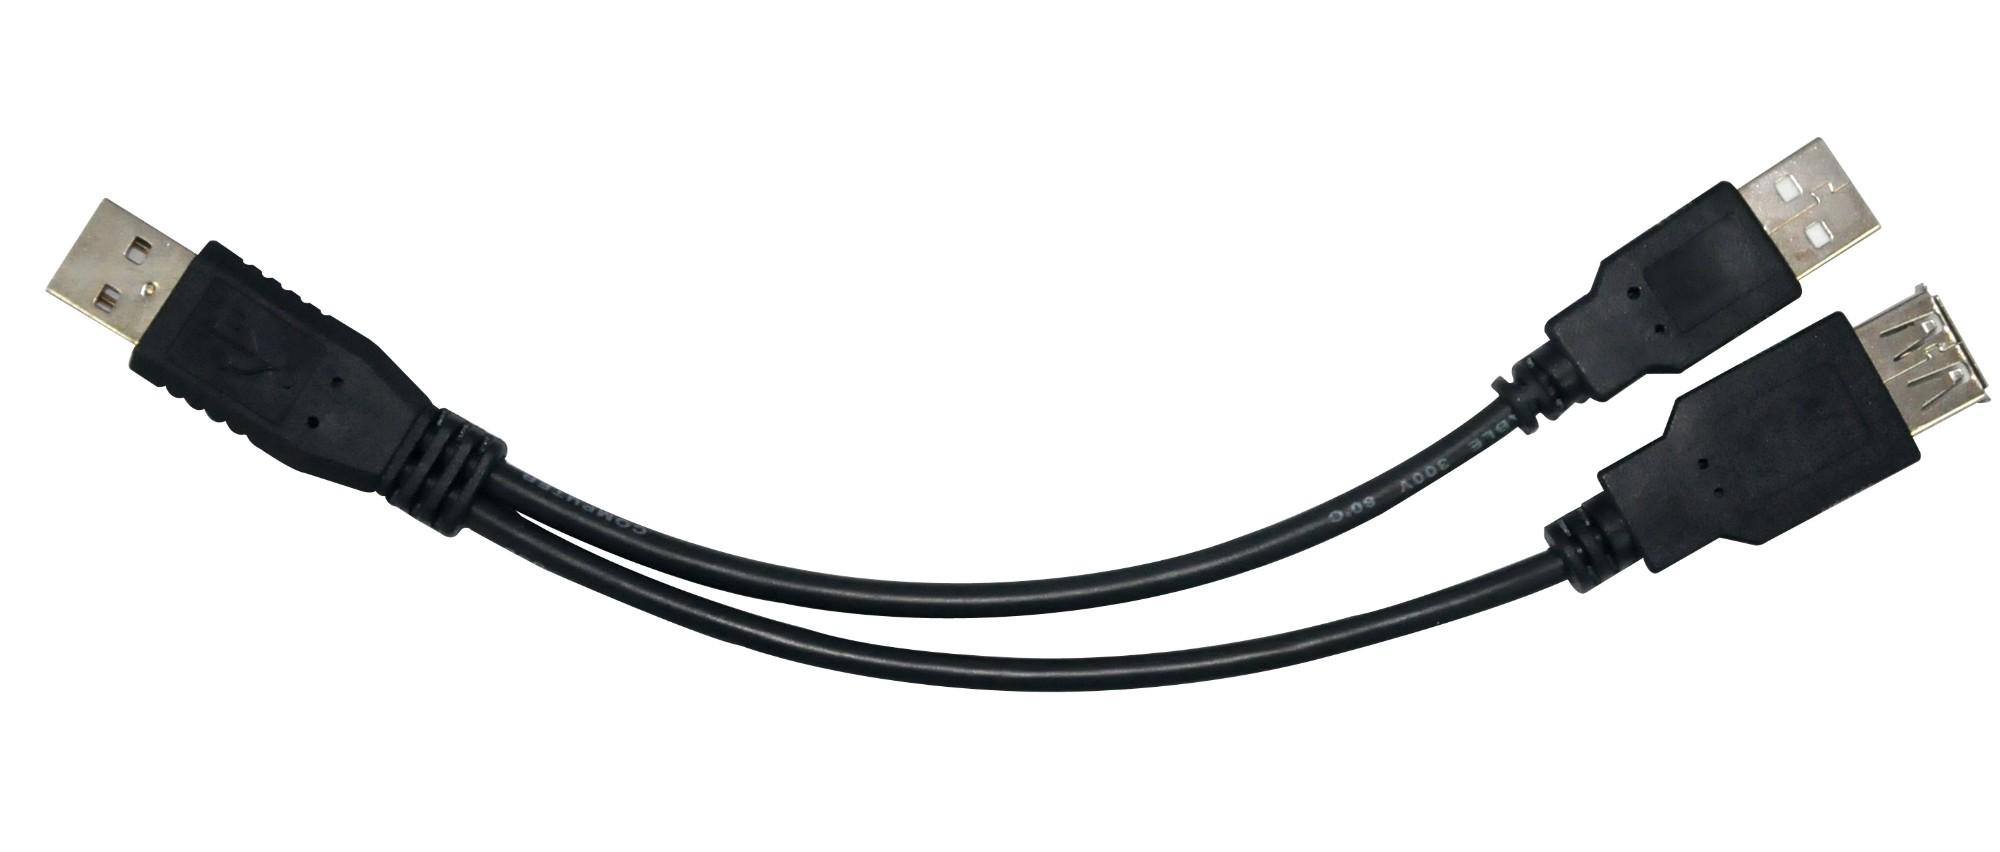 Astrotek USB A M/M+F USB cable 0.3 m 2 x USB Male Female Black